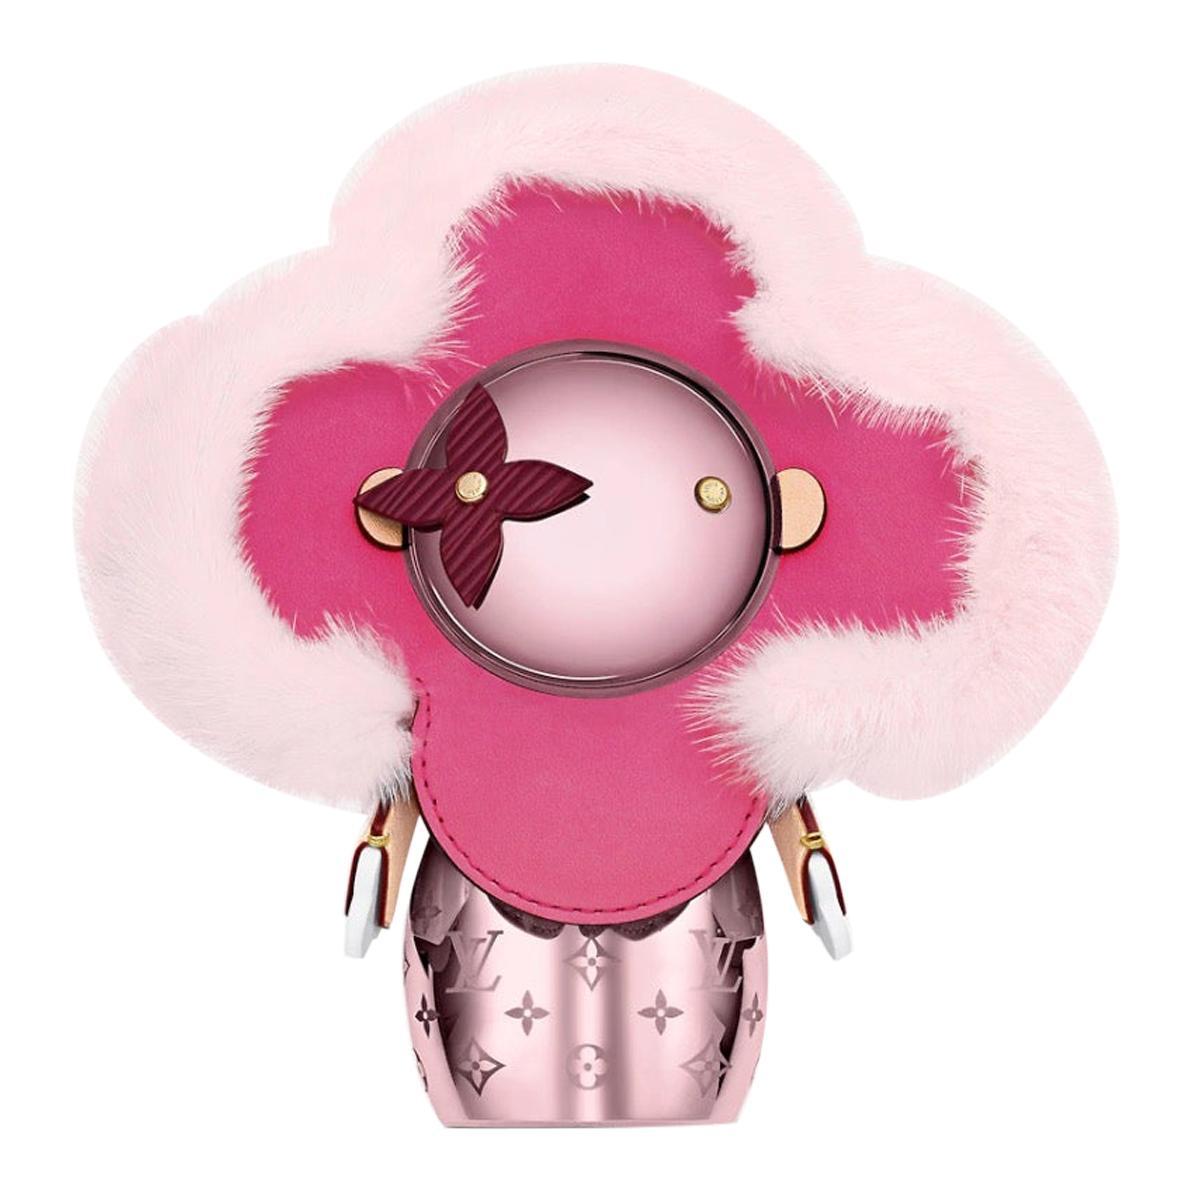 Louis Vuitton NEW Pink Metal Mink Fur Figurine Decorative Bear Toy in Box